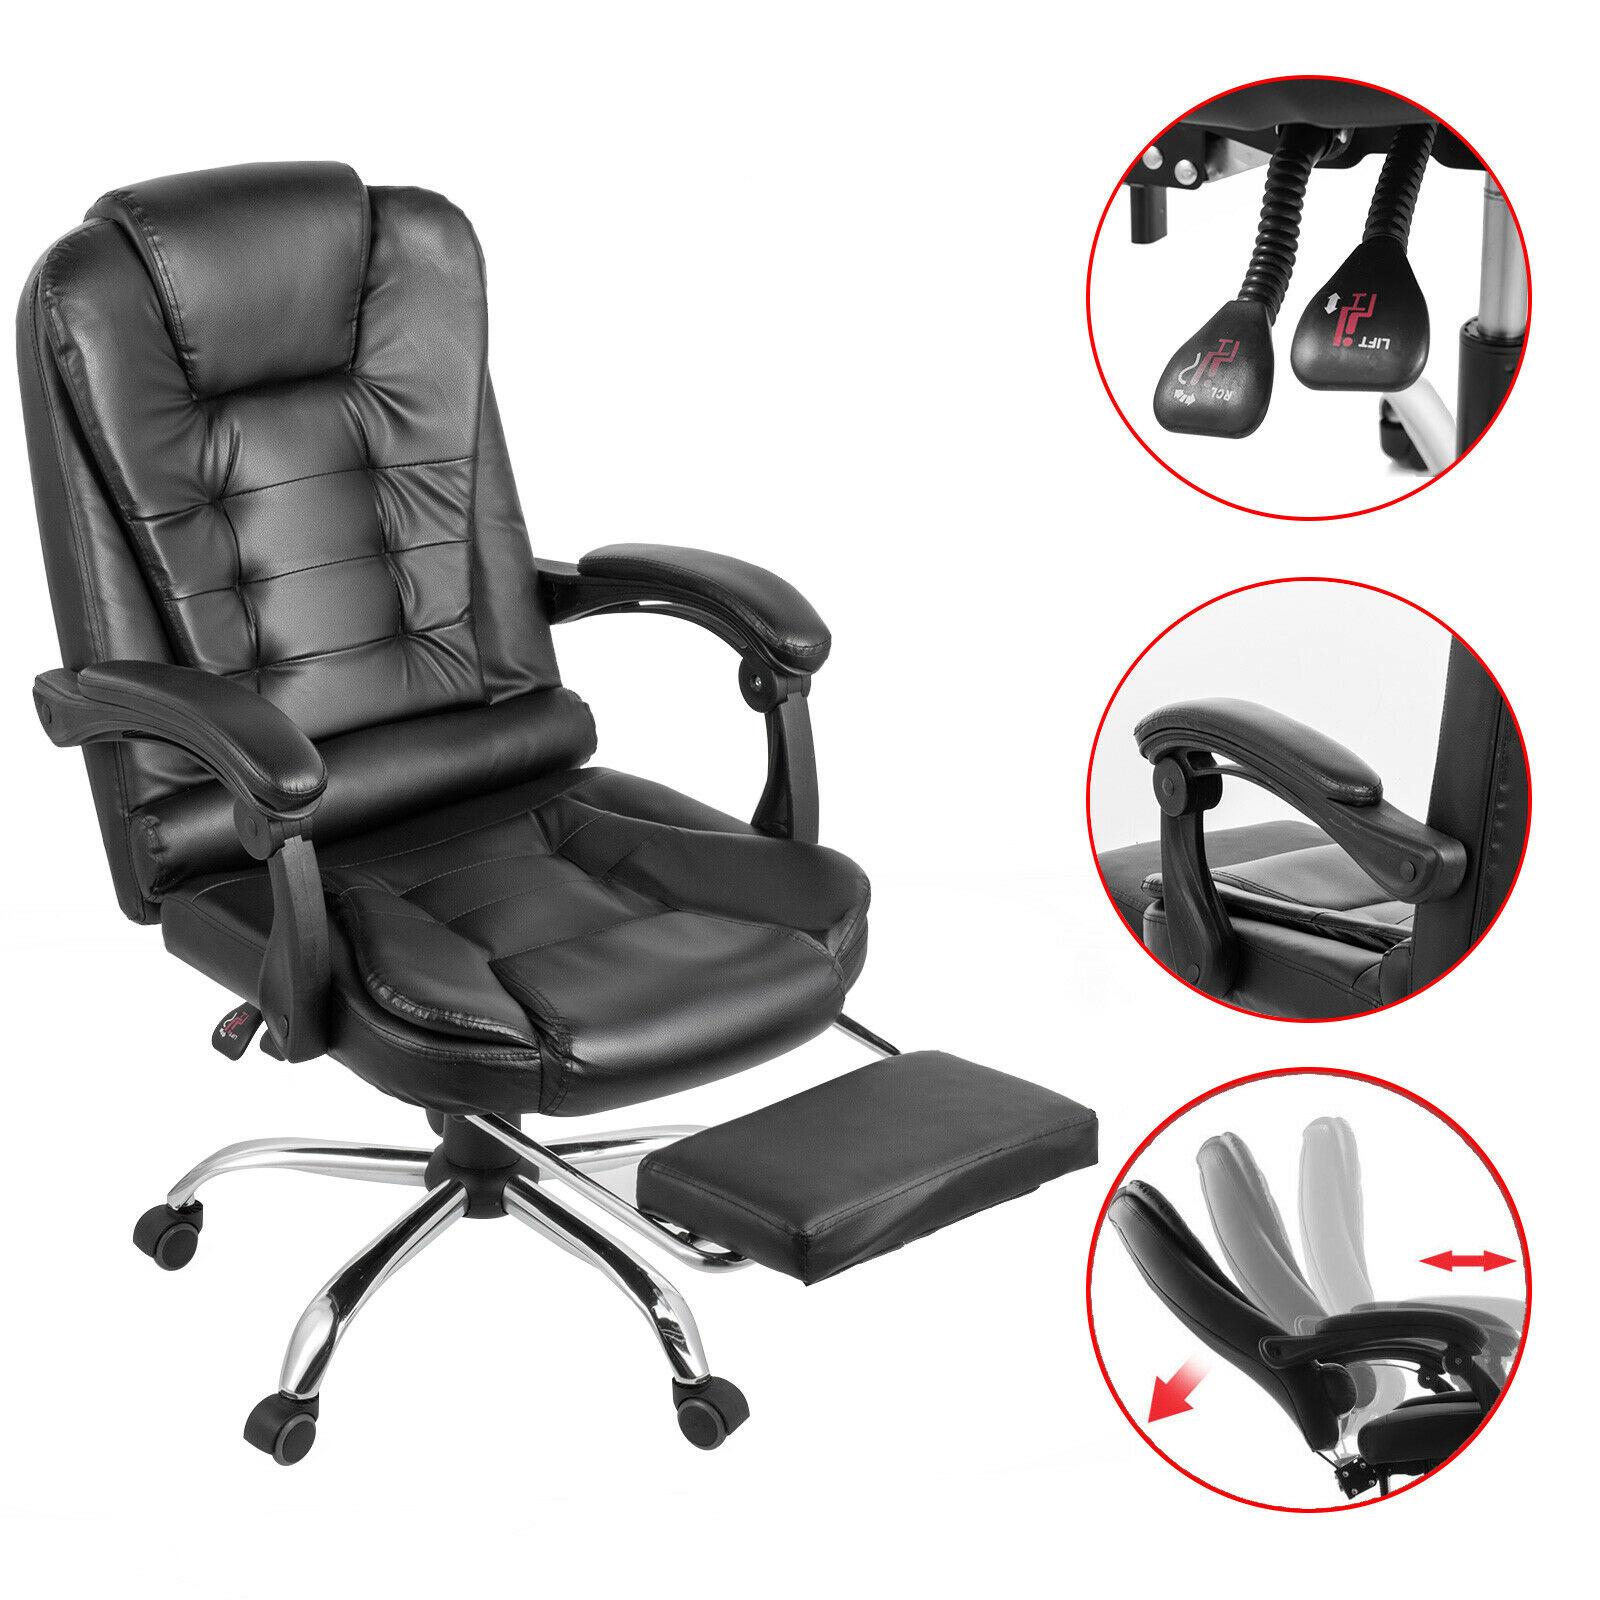 Comfortable Computer Chair Reclining Office Chair Tilt Height Adjust Swivel Office Chairs Aliexpress